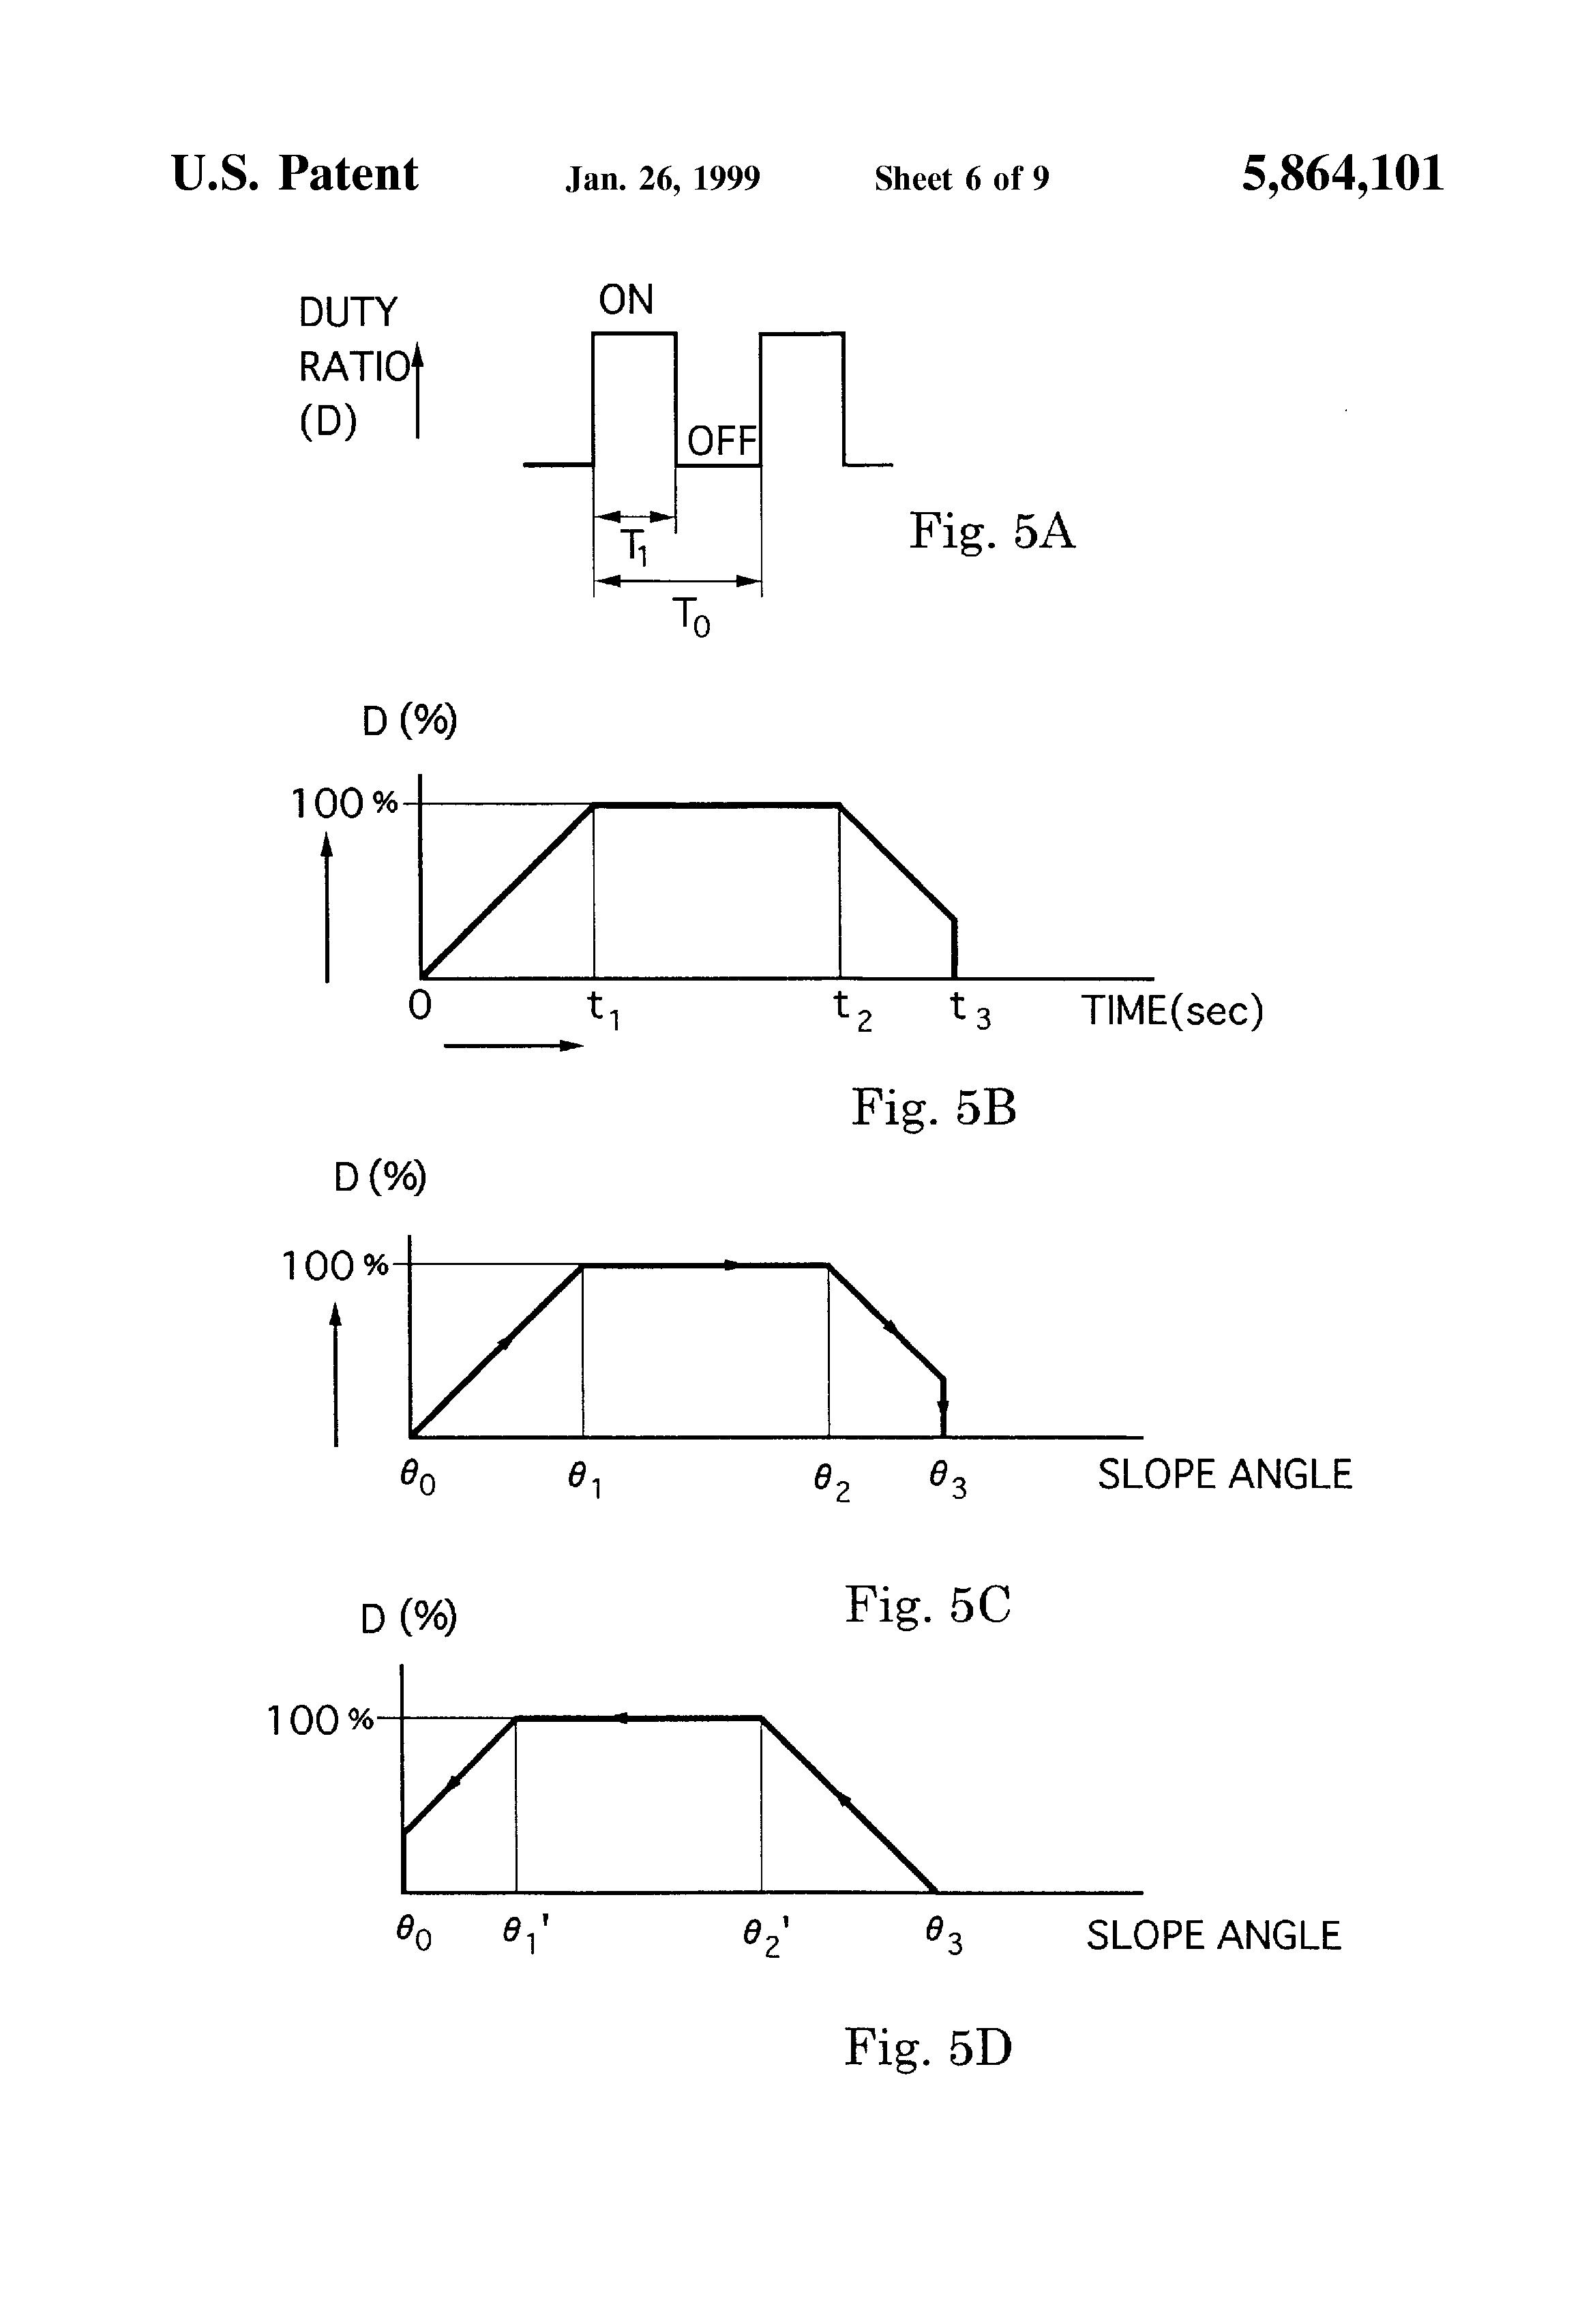 honda dx5000se generator wiring diagram wiring diagram \u0026 schematicsautowatch 674 ri wiring diagram schematic diagrams source · electrical repair manual for the hydraulic swim